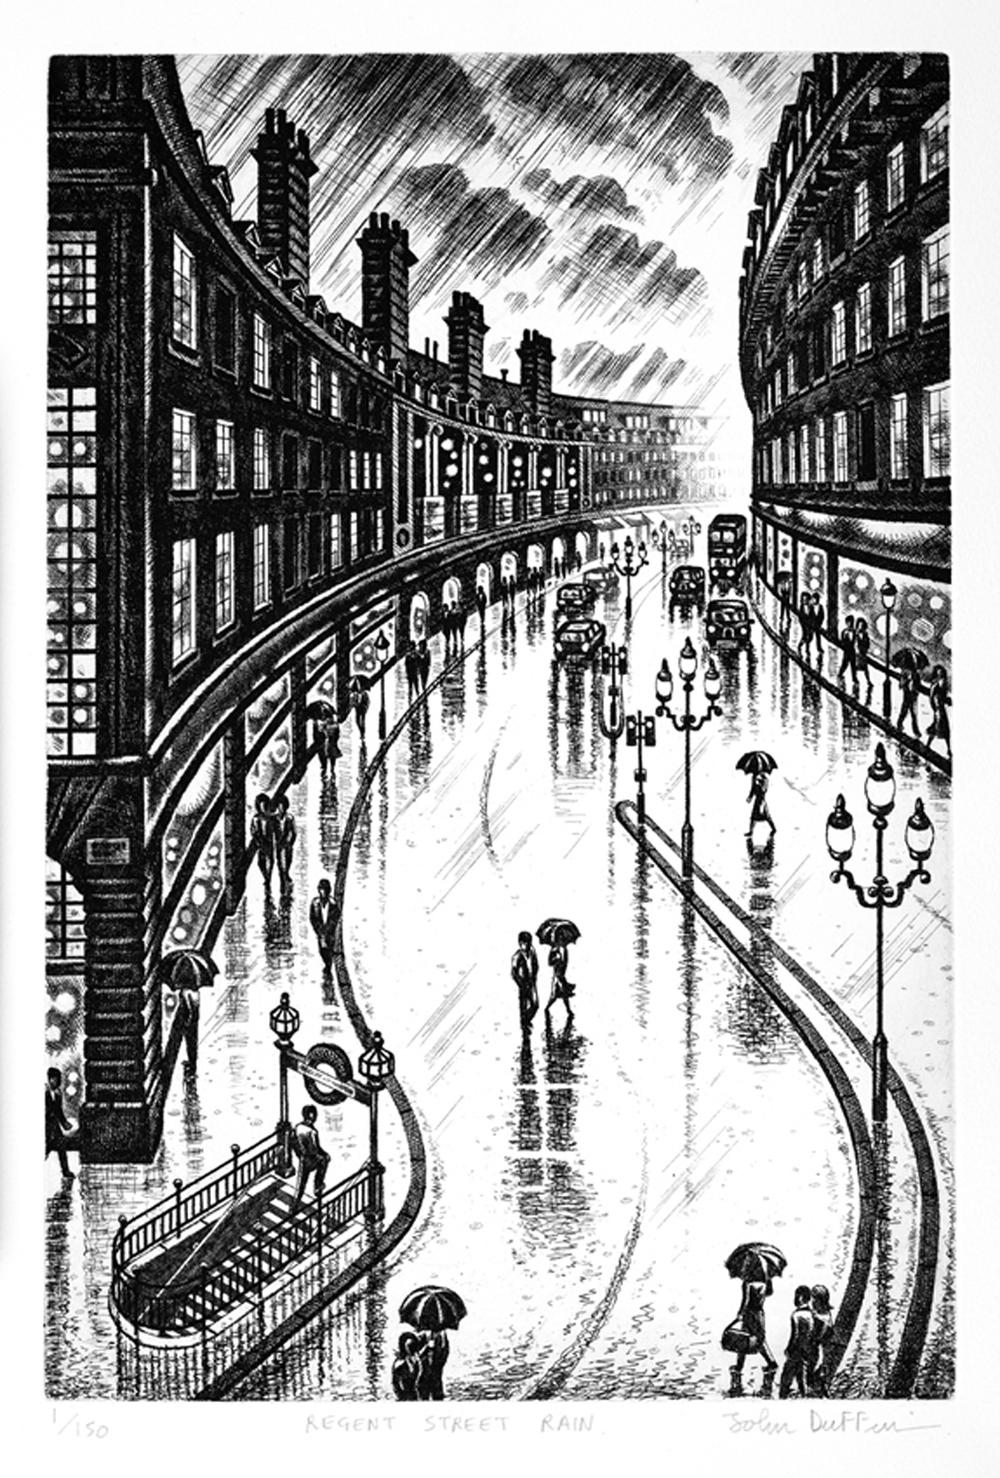 John Duffin Regent Street Rain etching